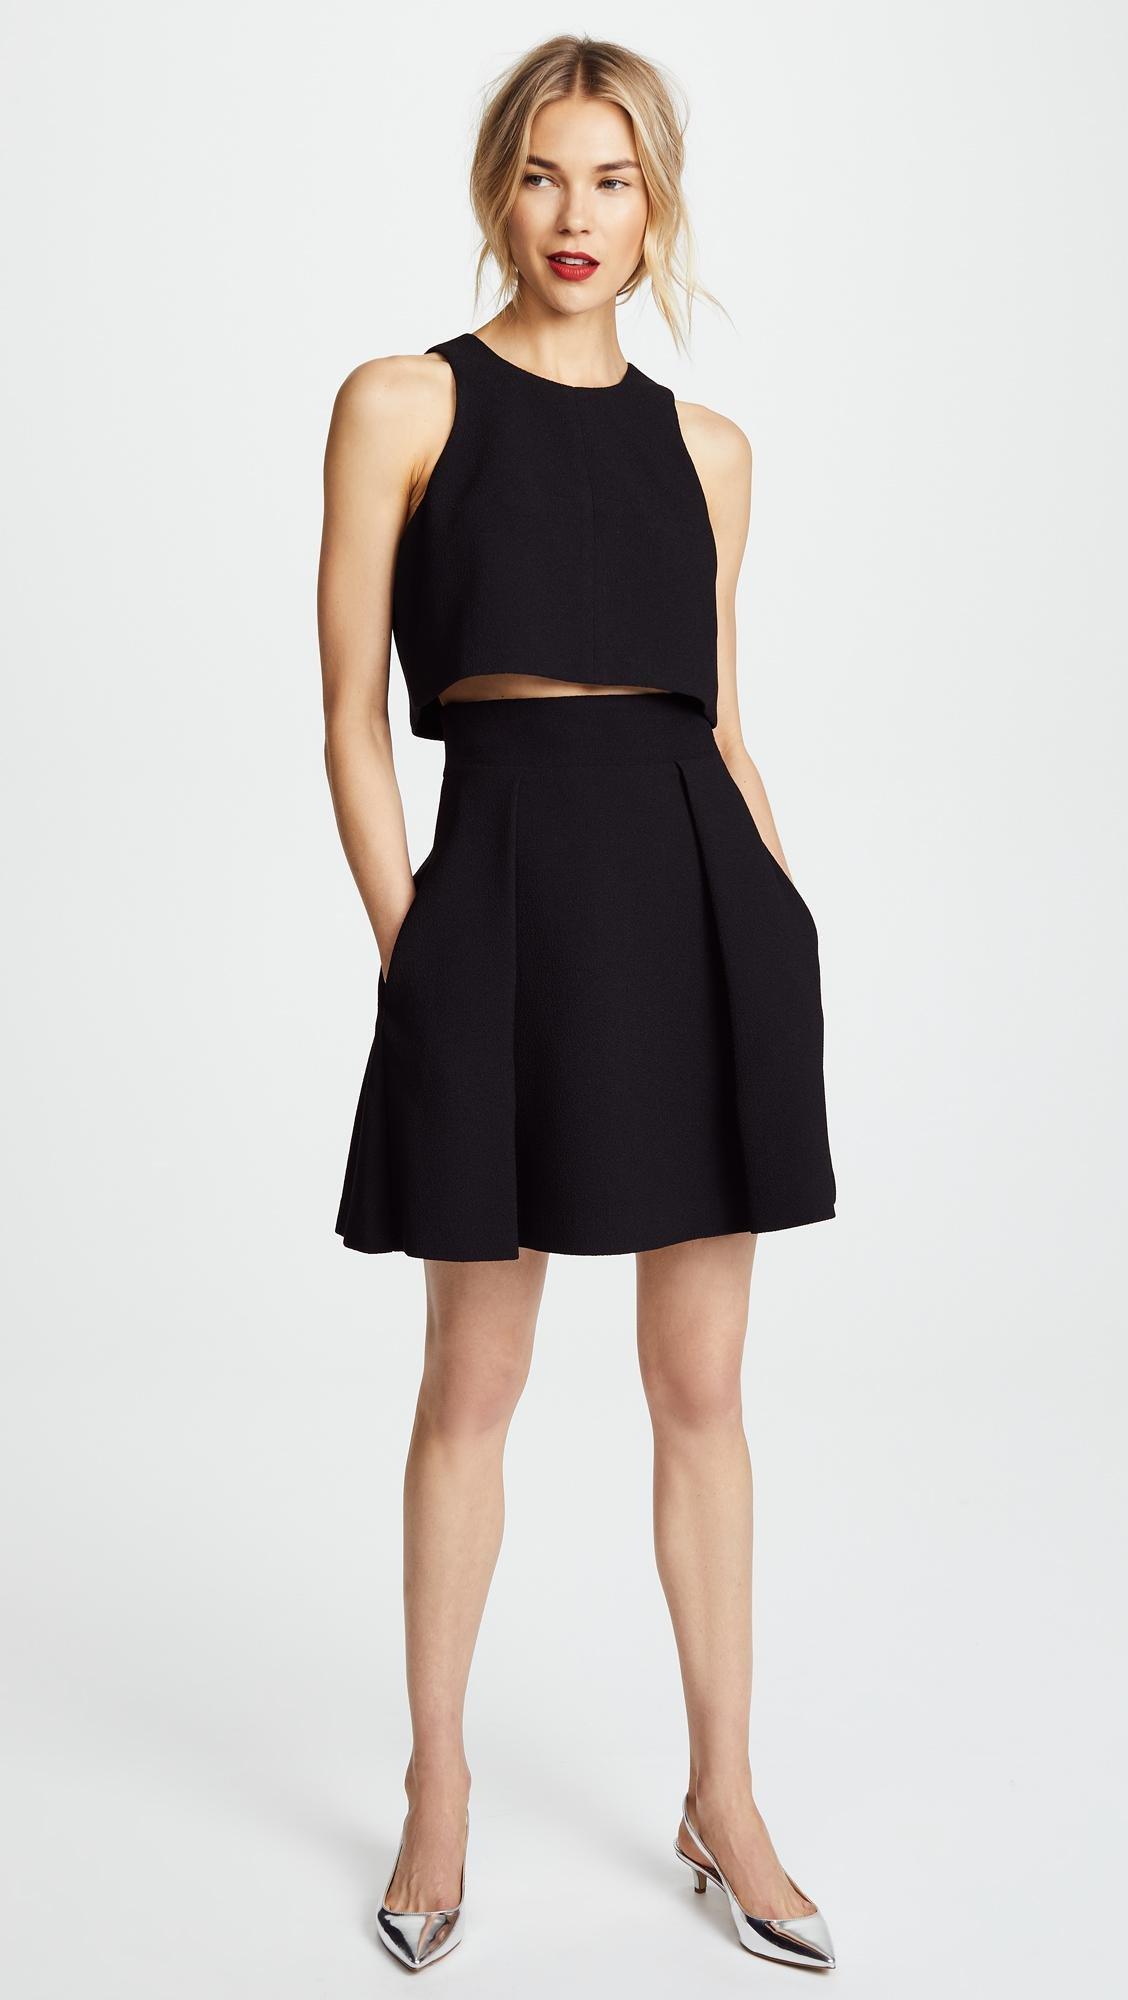 eaf50236e9c Black Halo Sanibel 2 Piece Mini Dress in Black - Lyst